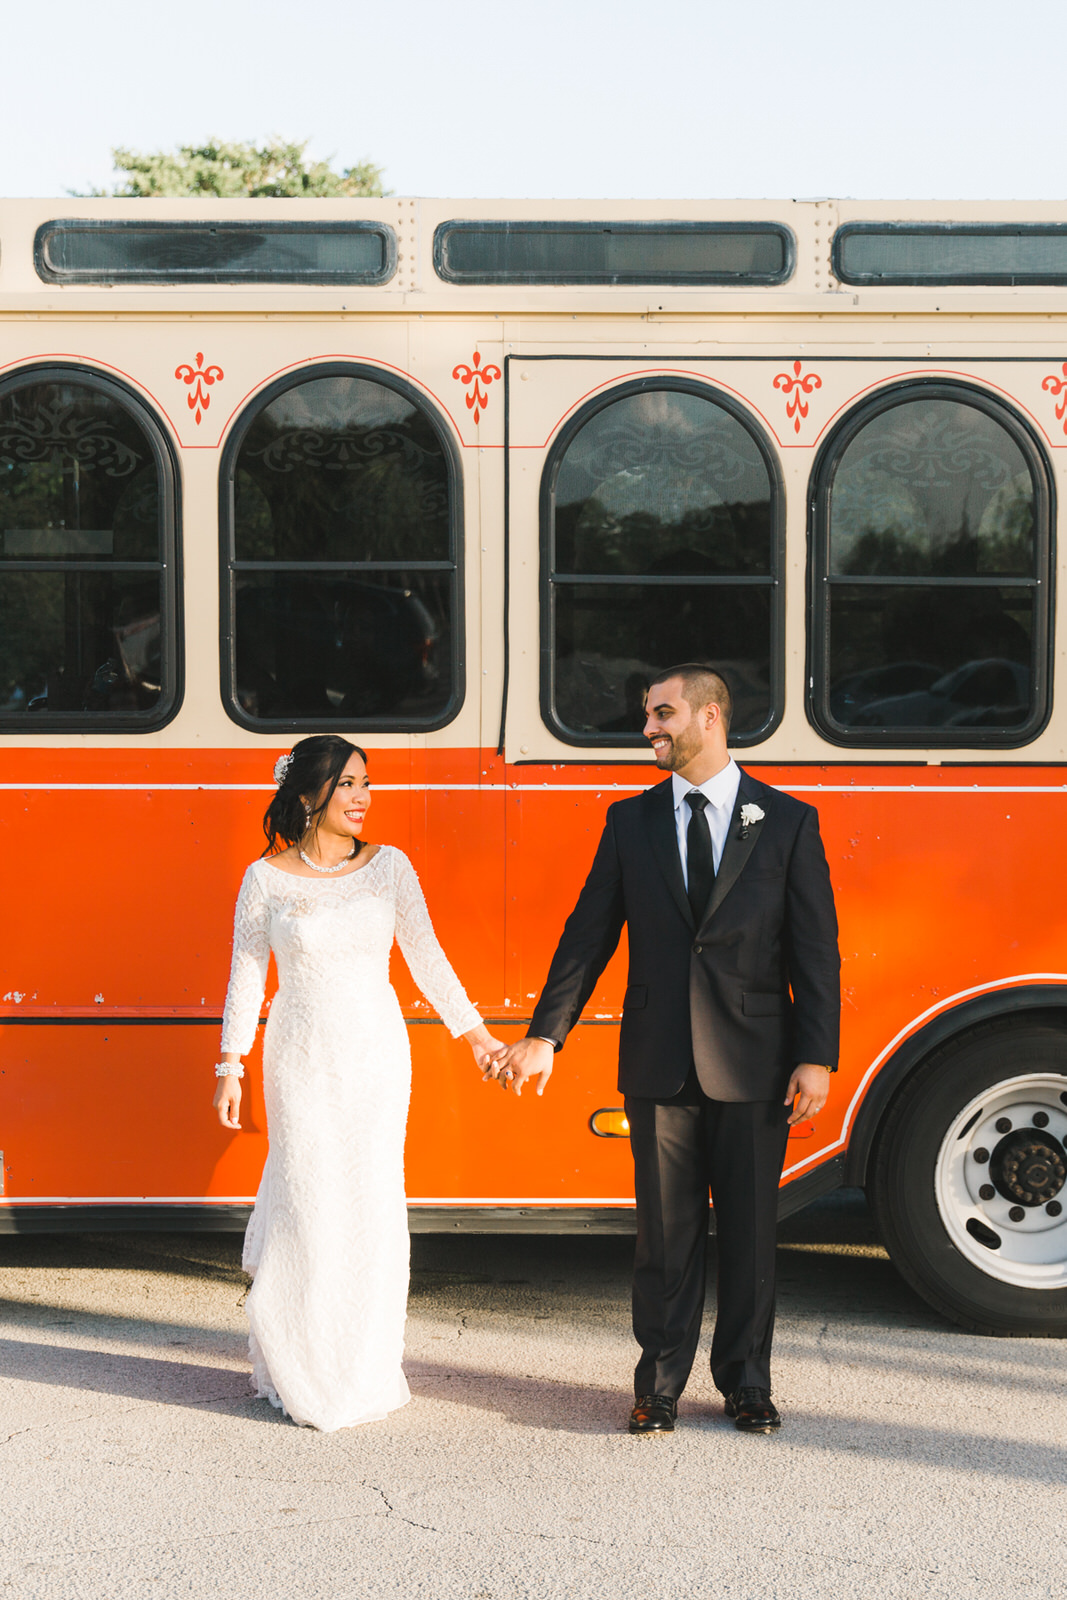 trolly wedding photos